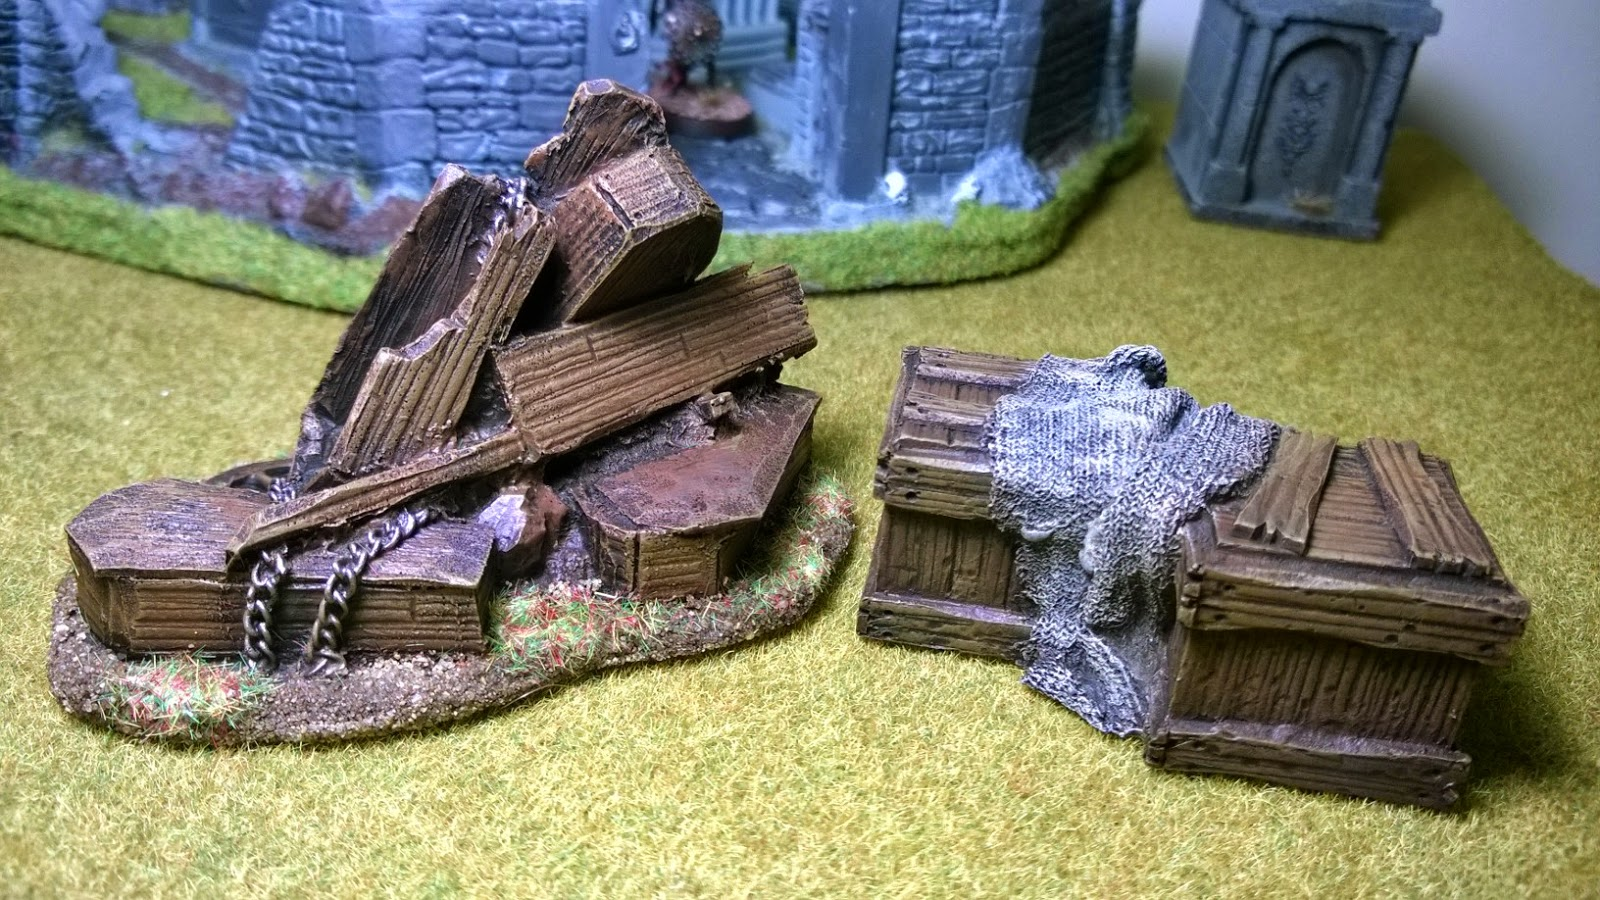 Malifaux undertakers props graveyard terrain scenery gothic horror